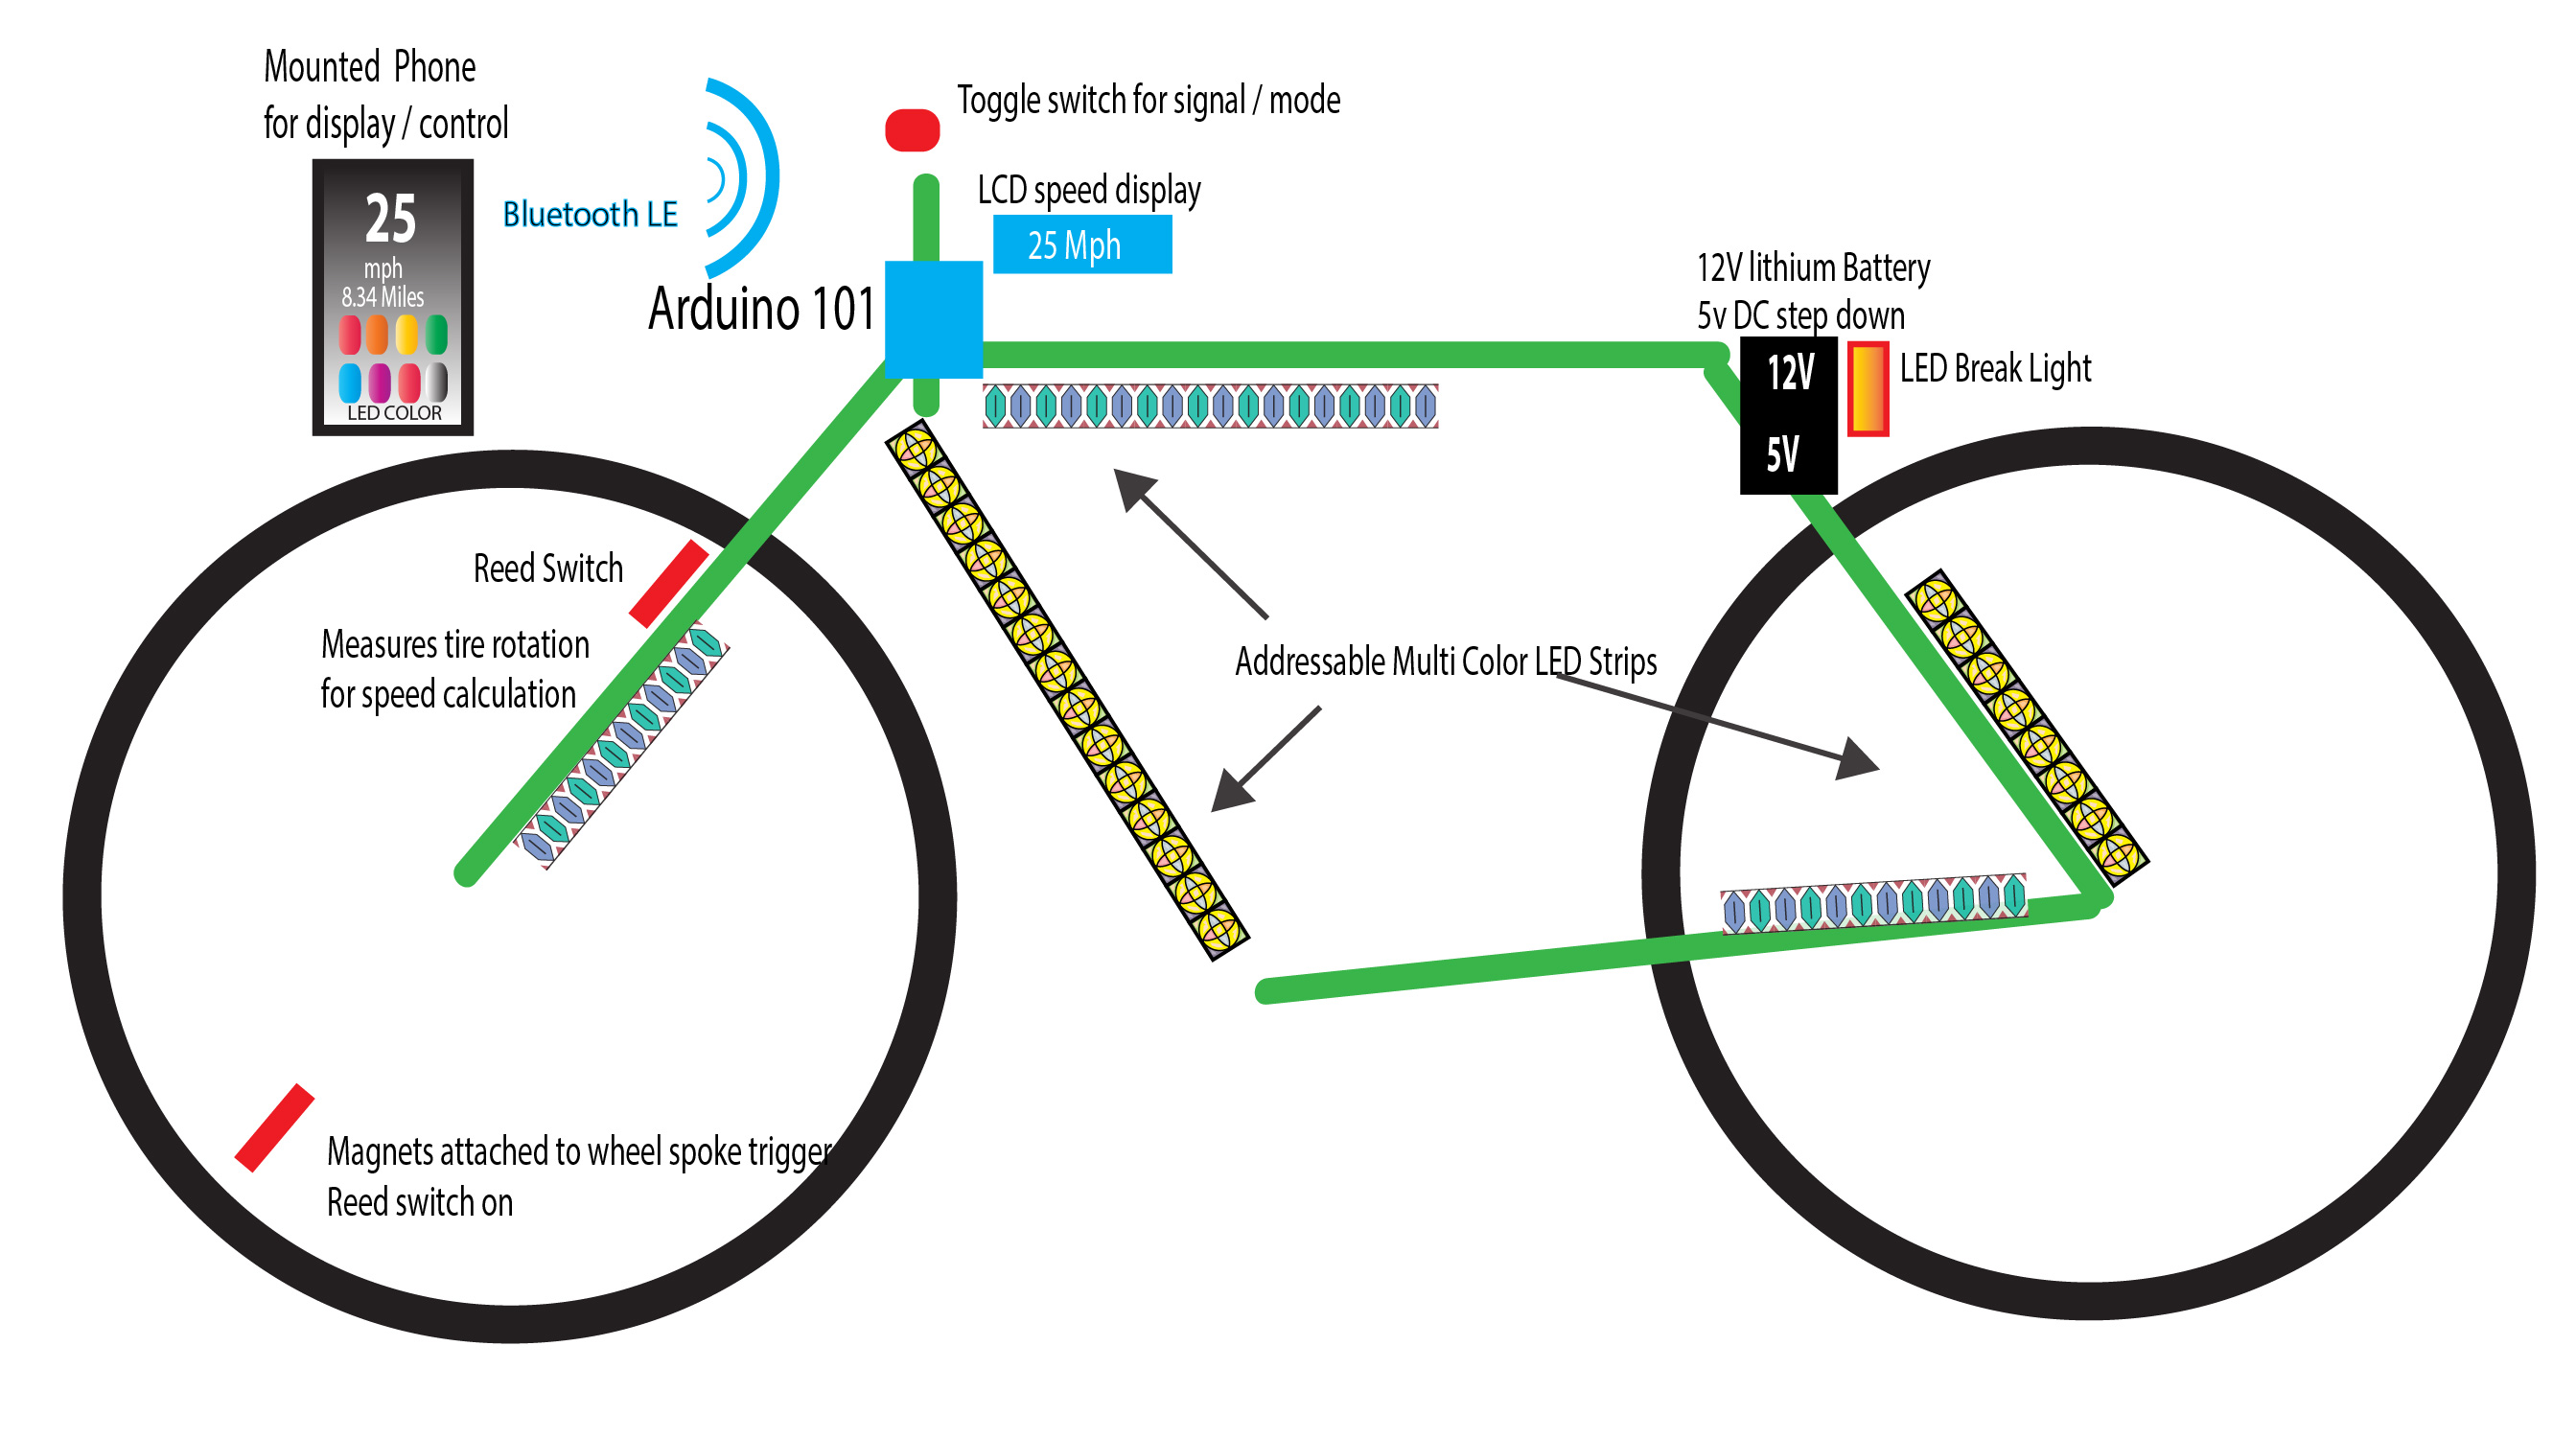 12v led wiring diagram tir4 wiring diagram pdf 12v led wiring diagram tir4 [ 2687 x 1501 Pixel ]